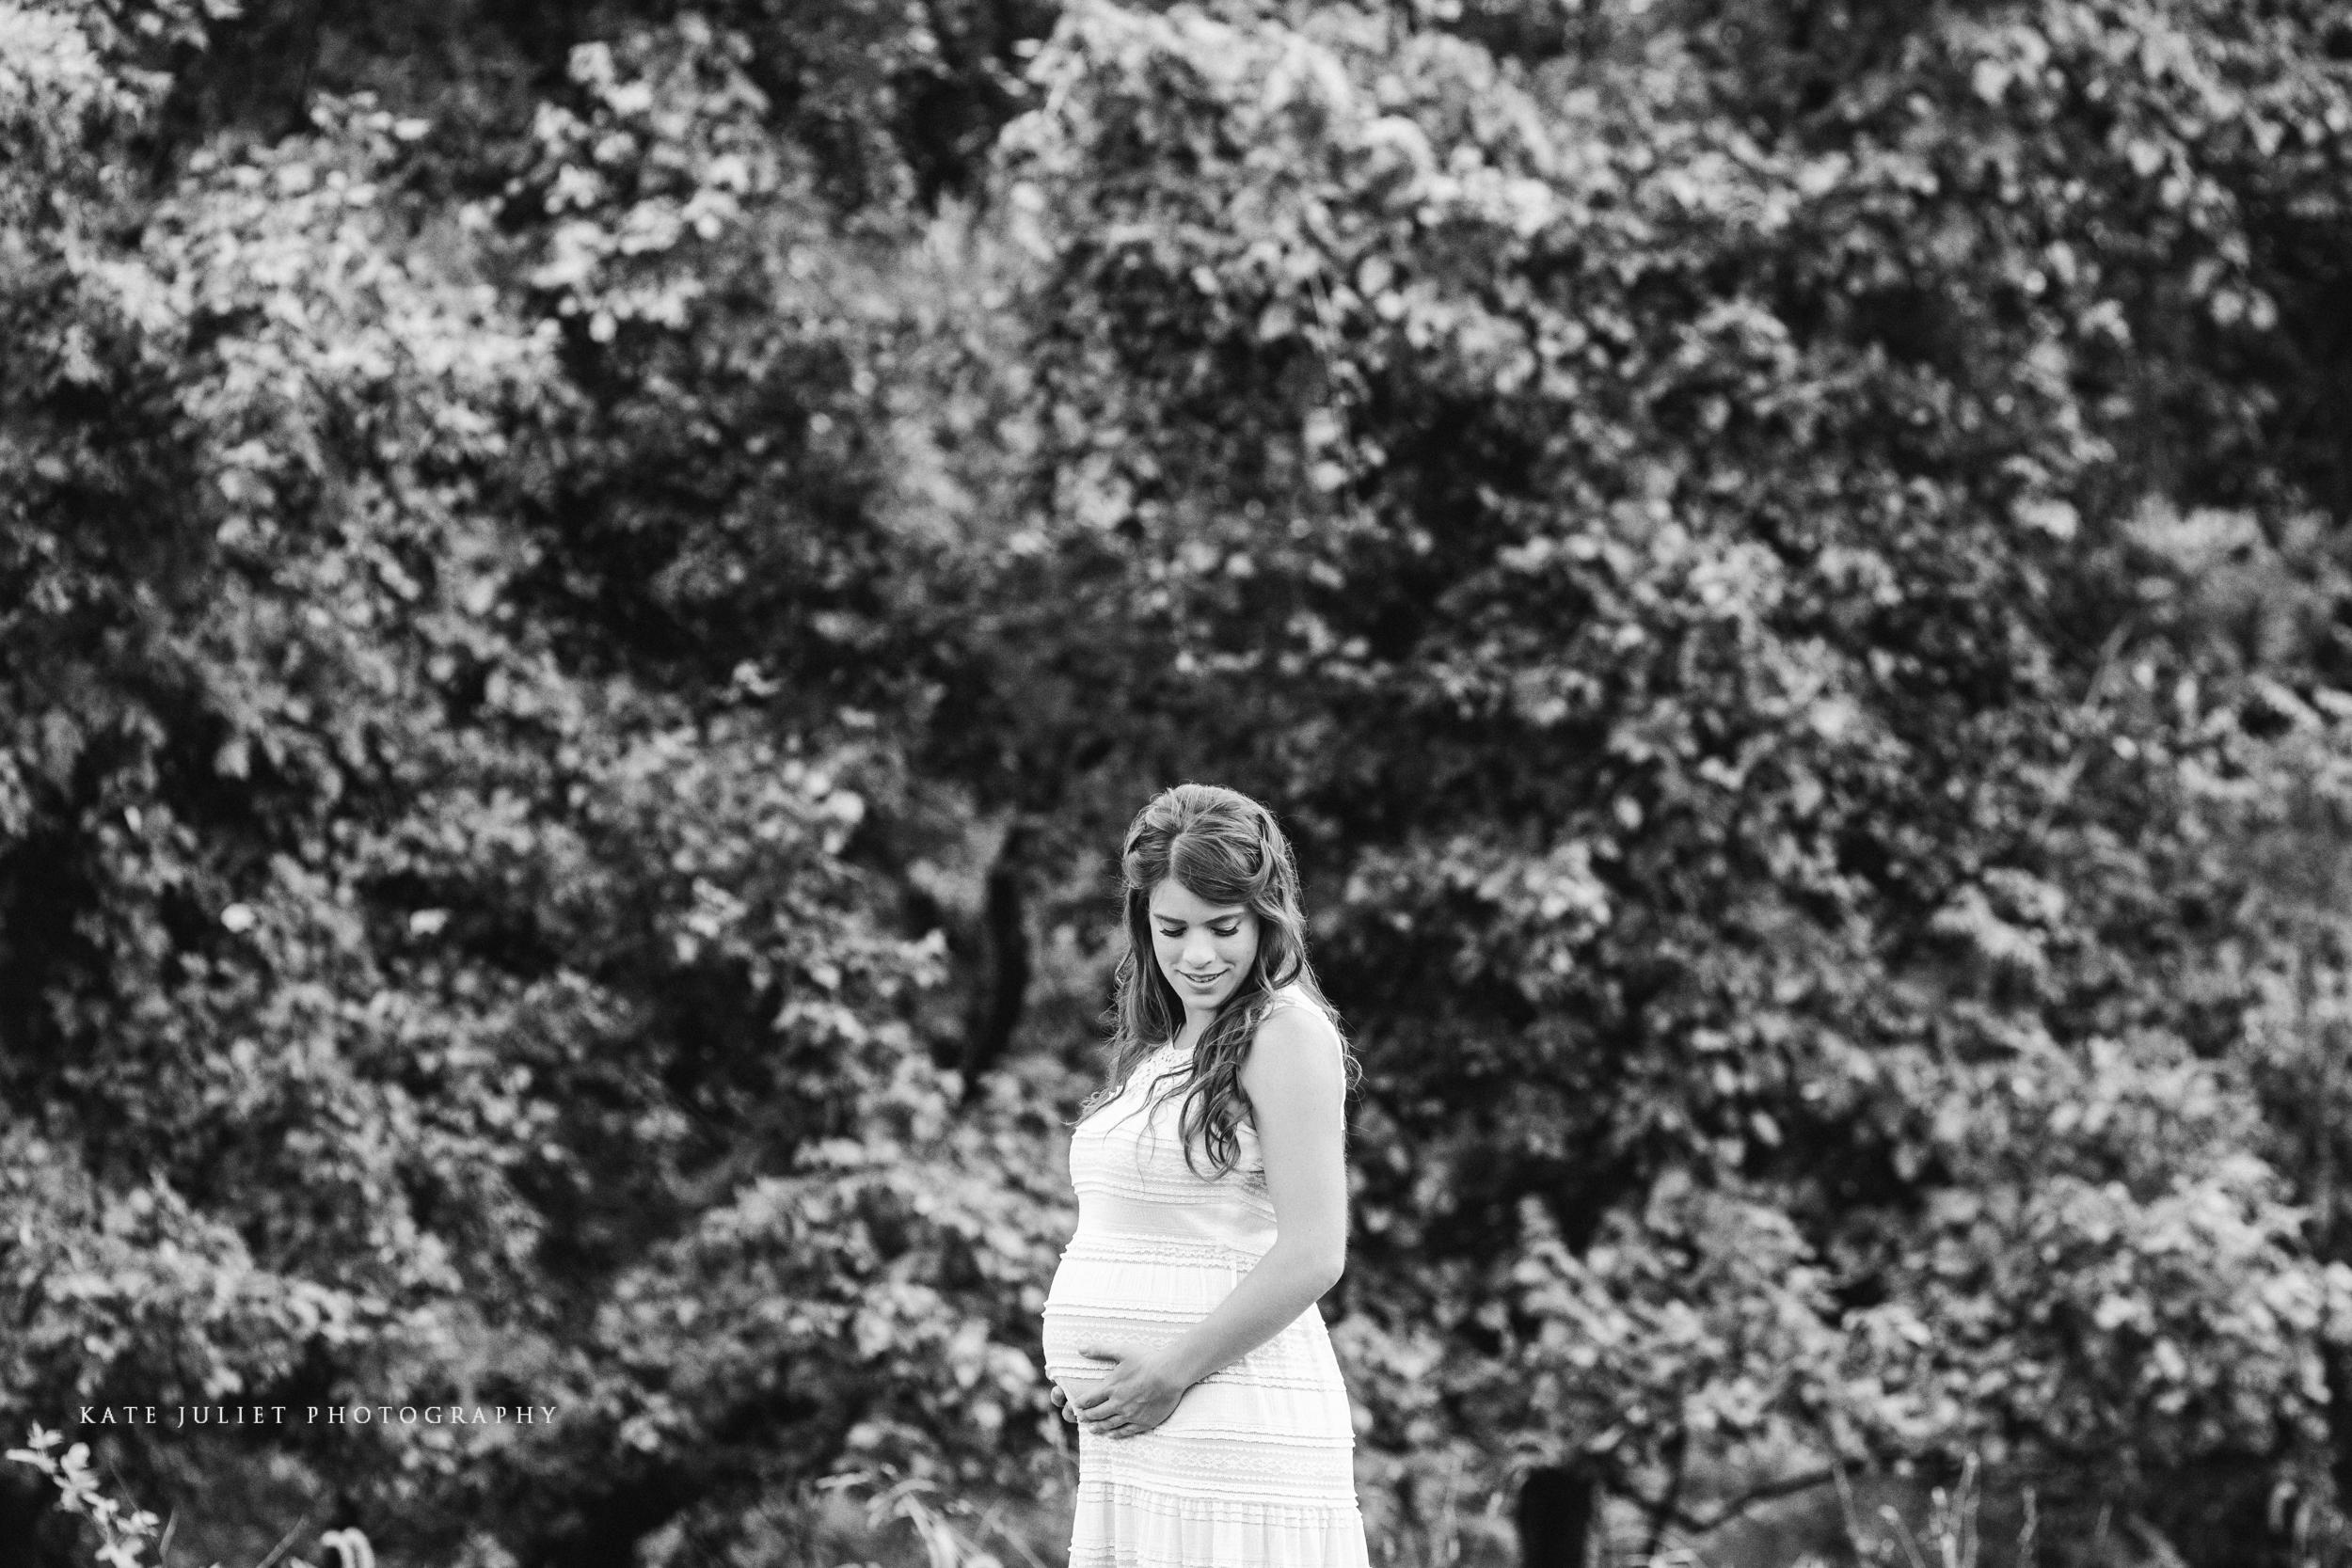 kate juliet photography - maternity - web -8.jpg